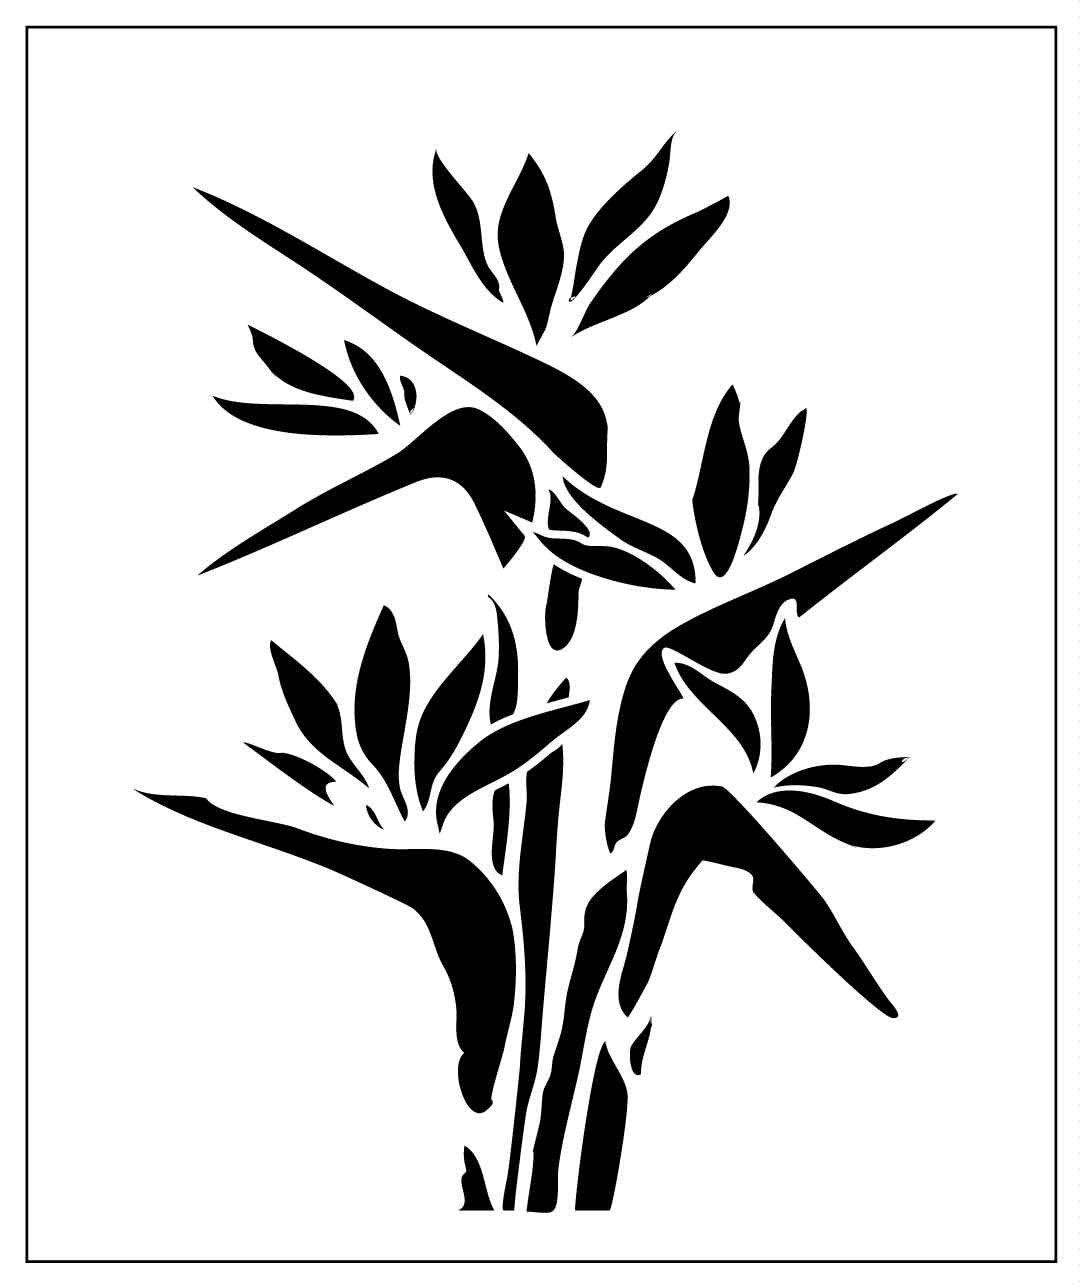 Bird of Paradise flower on laser-cut stencil by